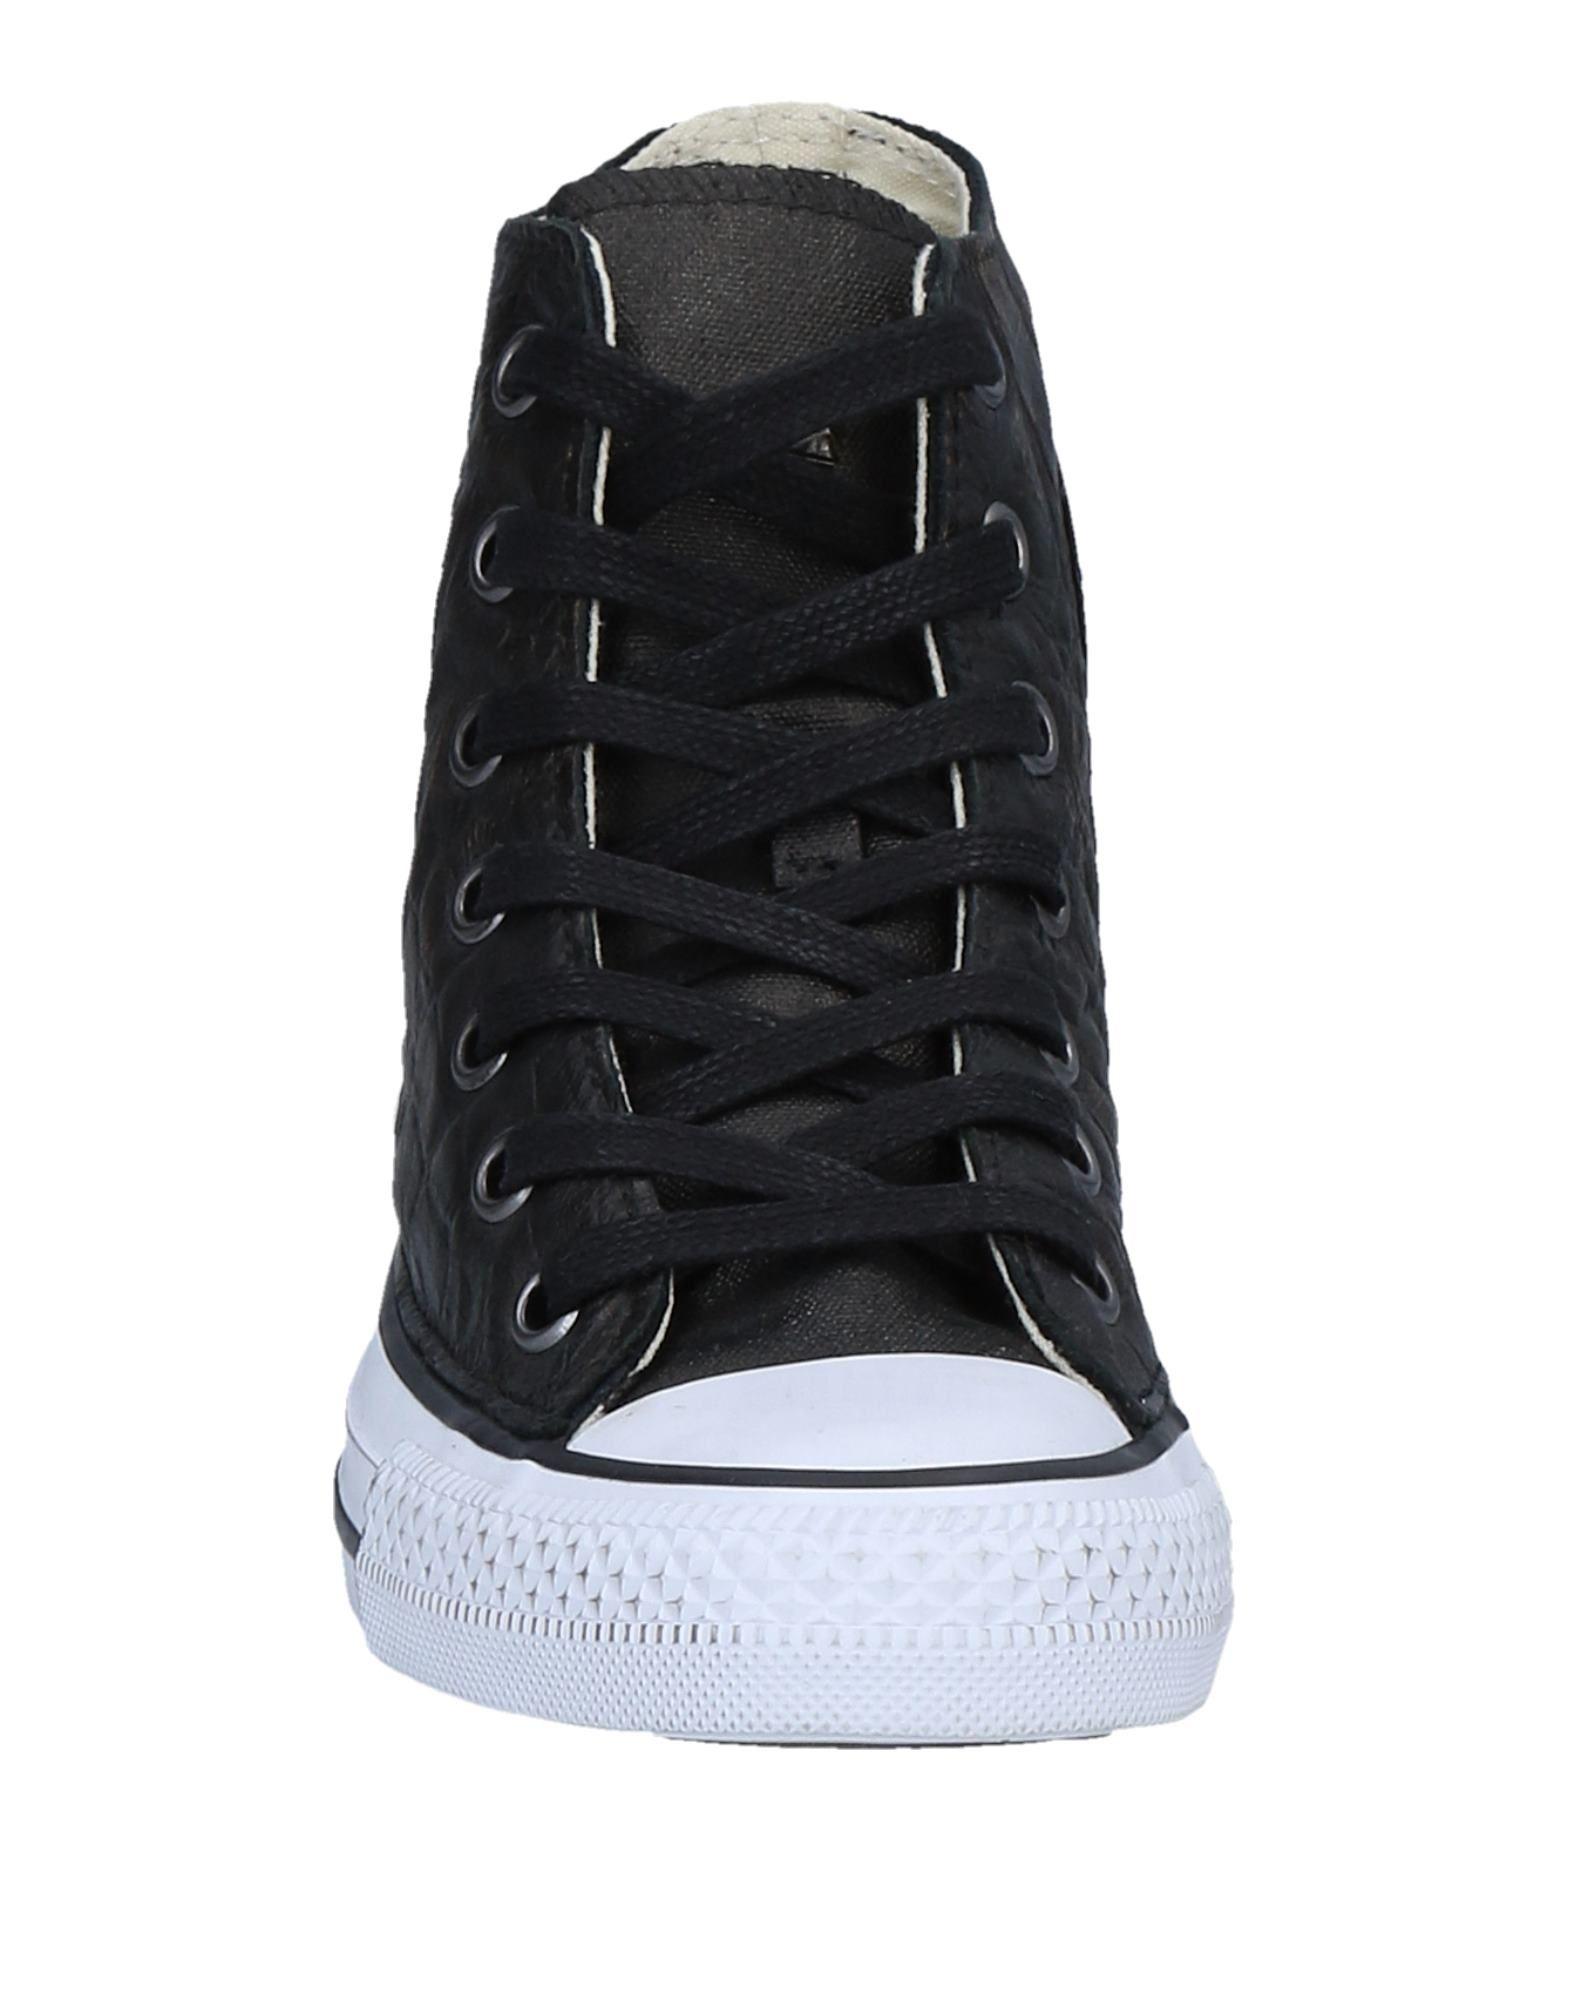 Gut um billige Damen Schuhe zu tragenConverse Limited Edition Sneakers Damen billige  11509915VX 655979